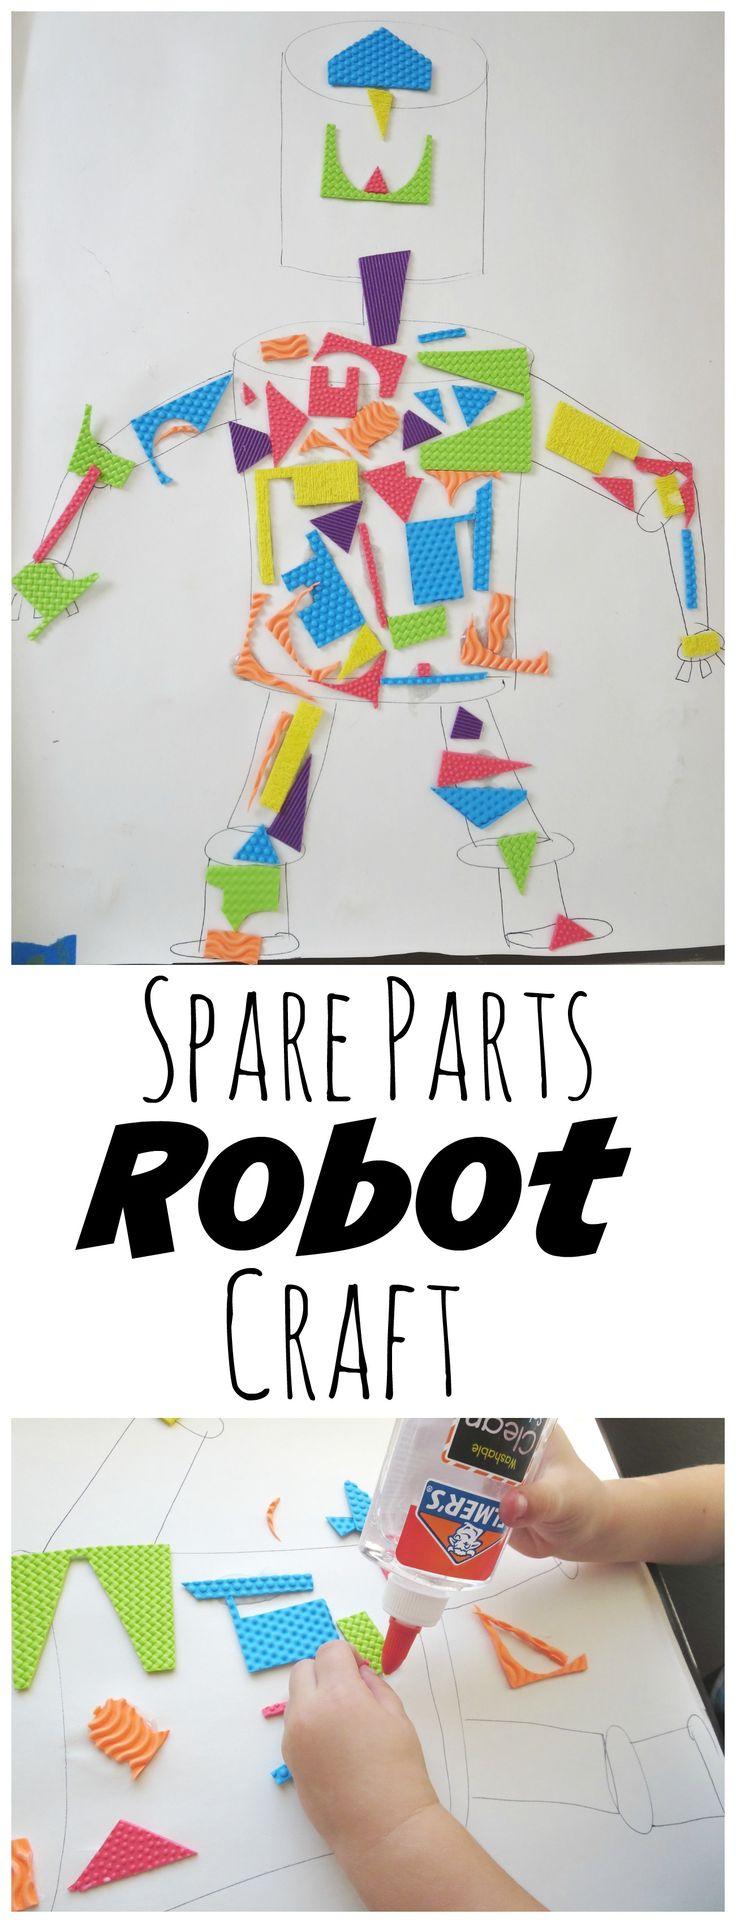 Spare Parts Robot Craft